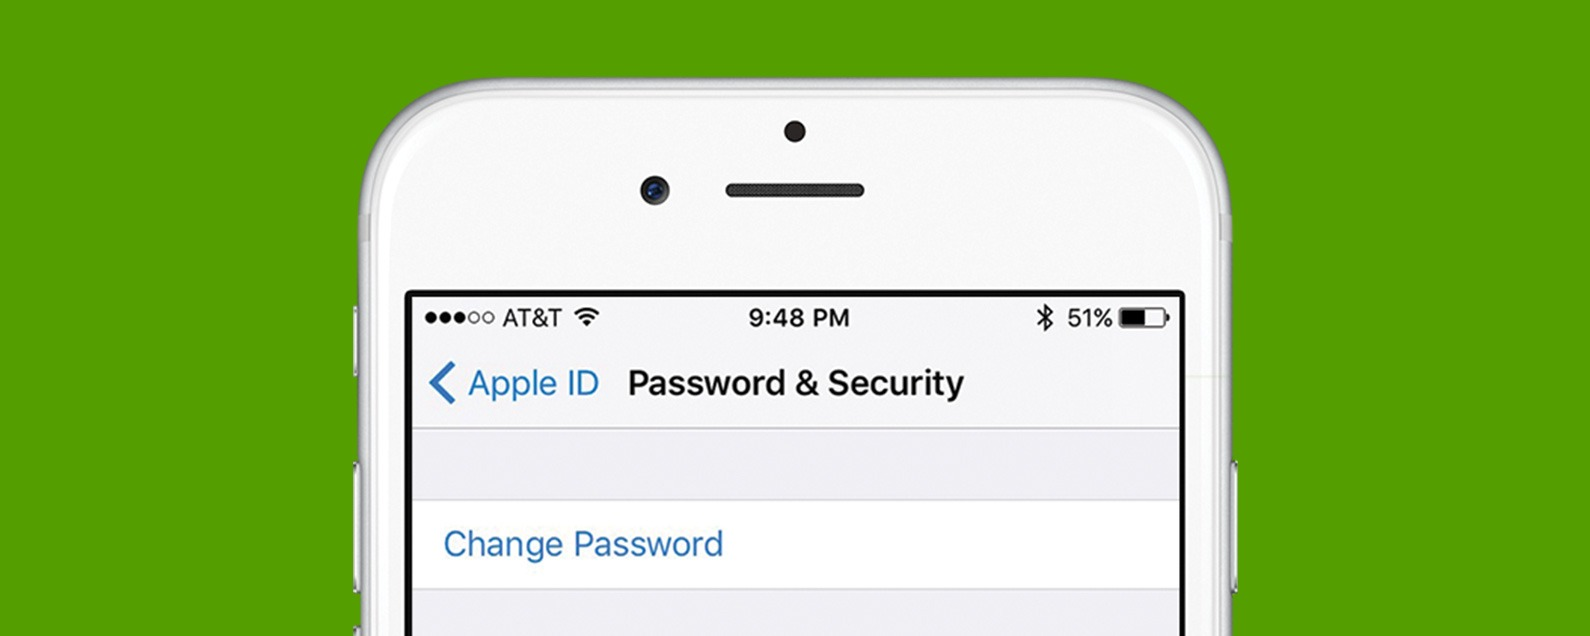 Just hook up forgot password